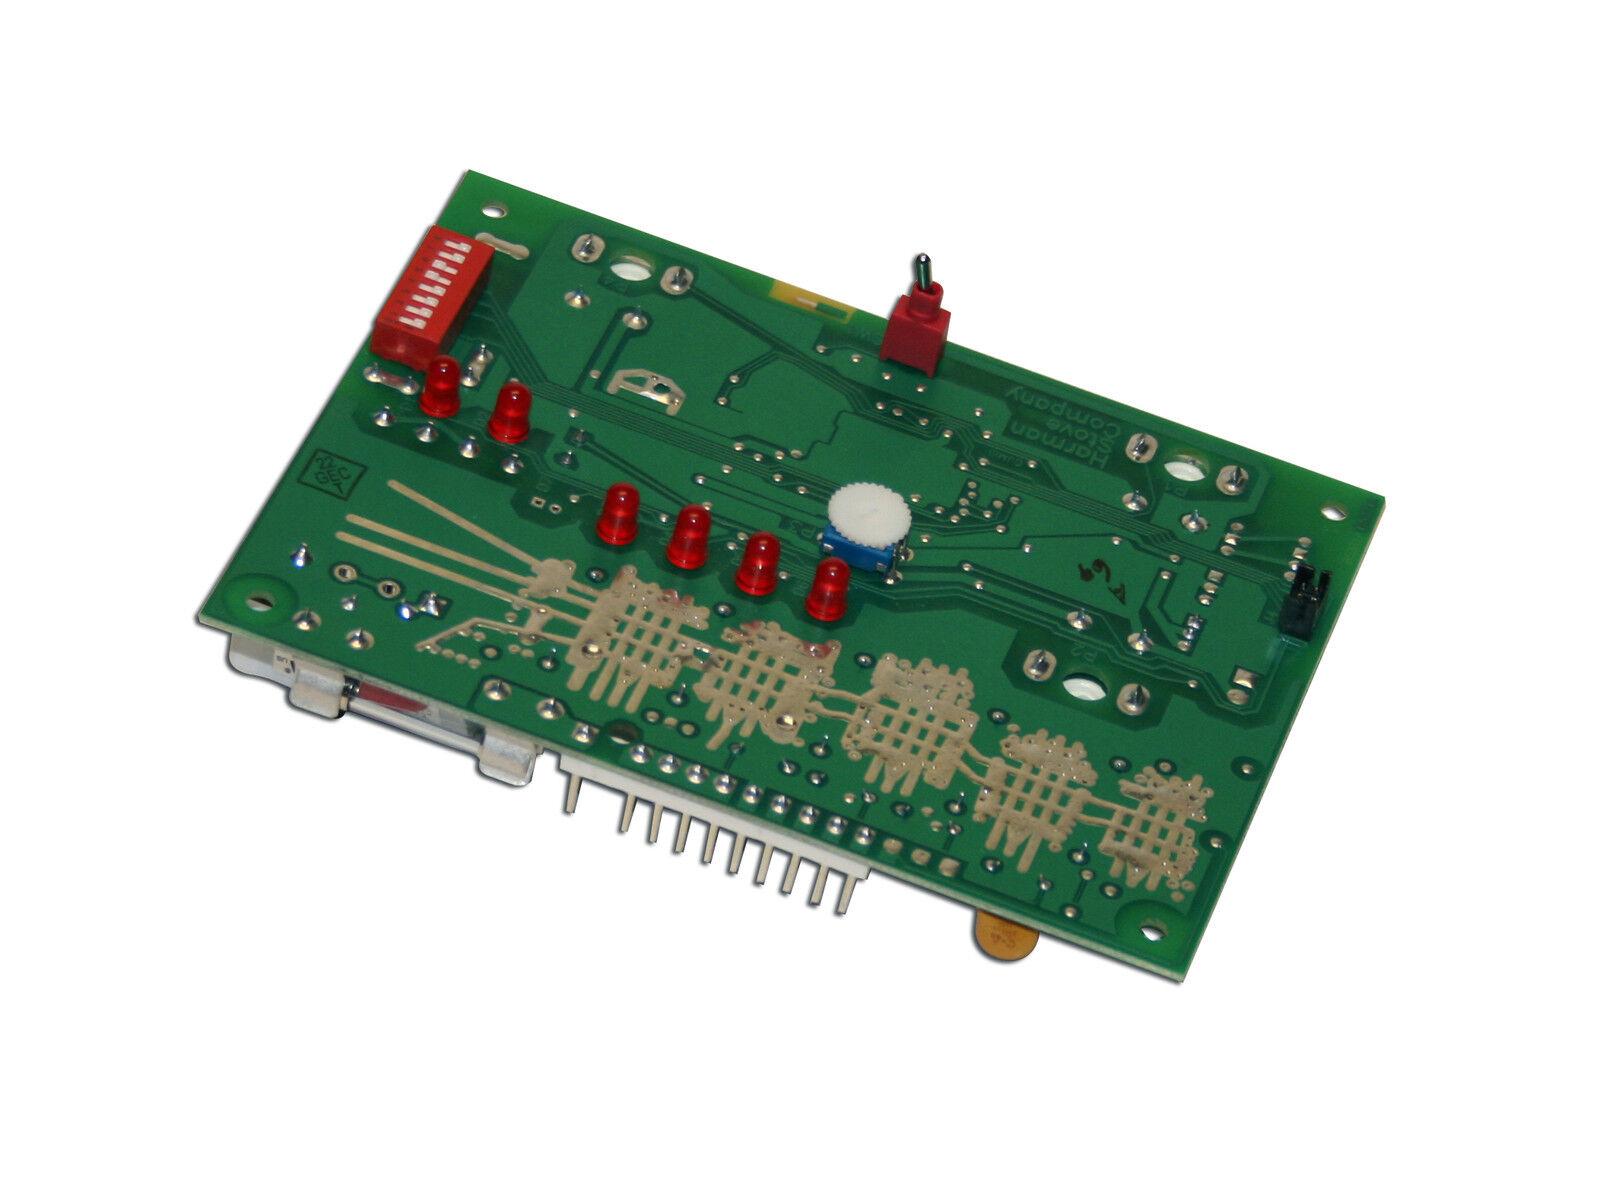 Harmon tablero de control Harman placa de circuito de computadora 3-20-05374//1-00-05886